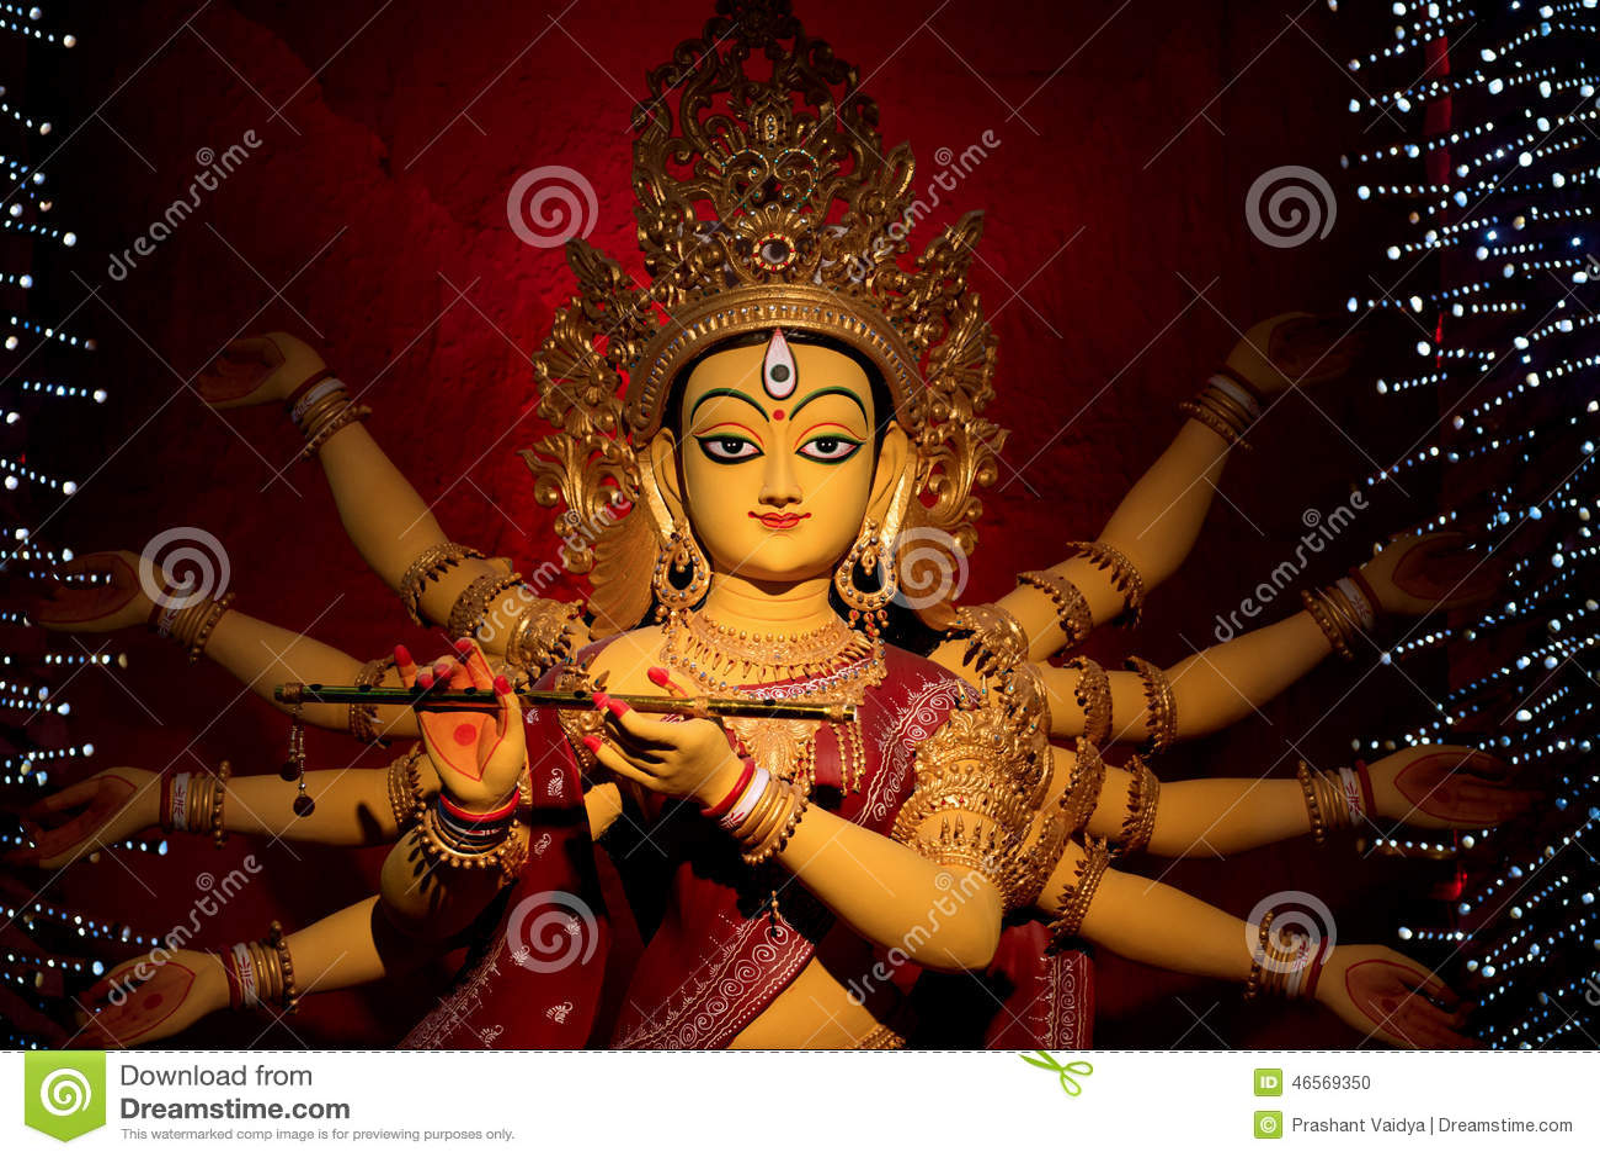 10 373 Durga Photos Free Royalty Free Stock Photos From Dreamstime